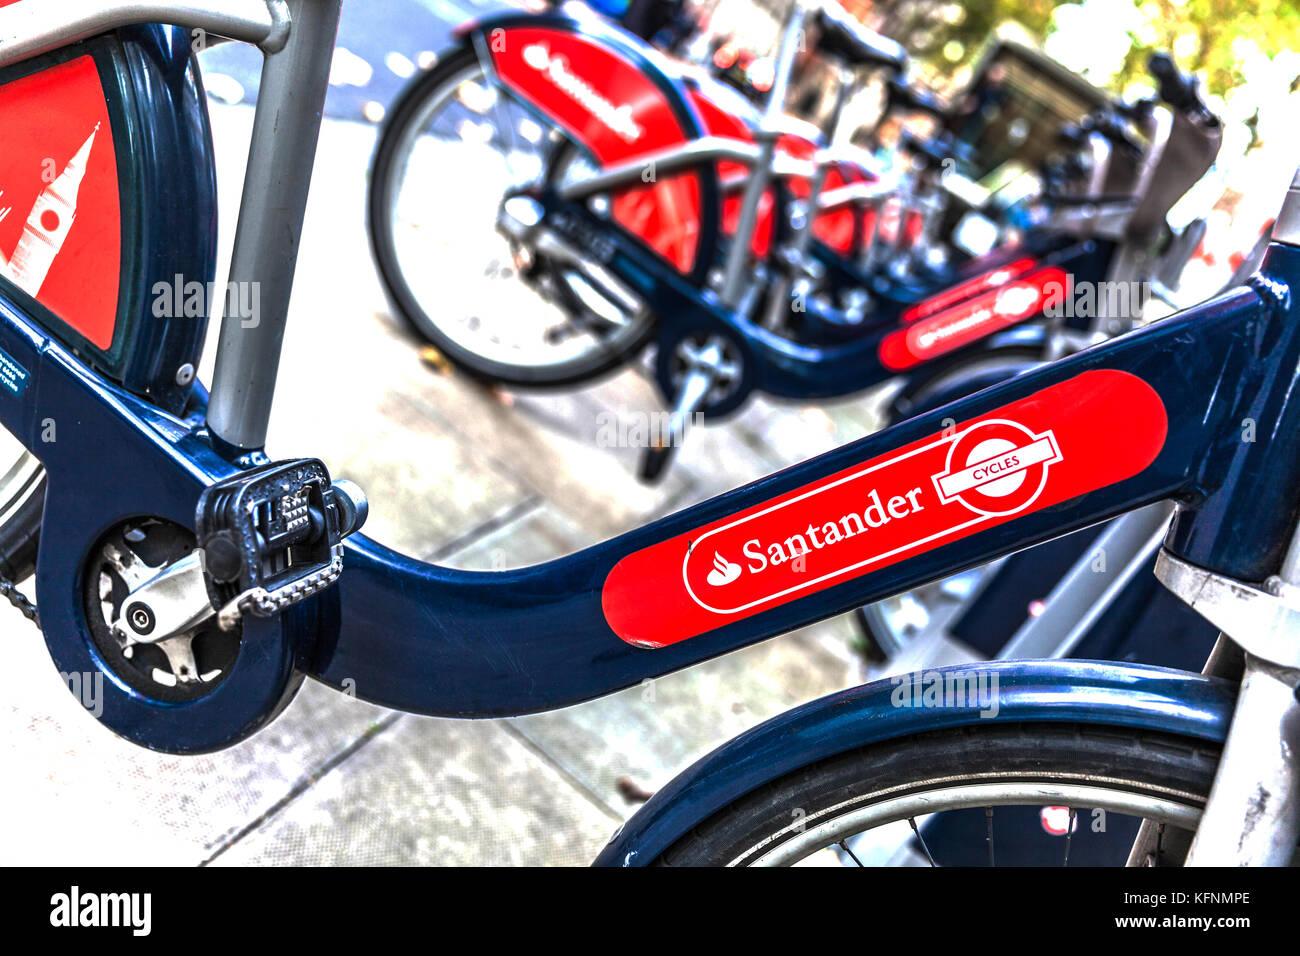 Santander cycles, self service cycle hire, London, England, UK. - Stock Image